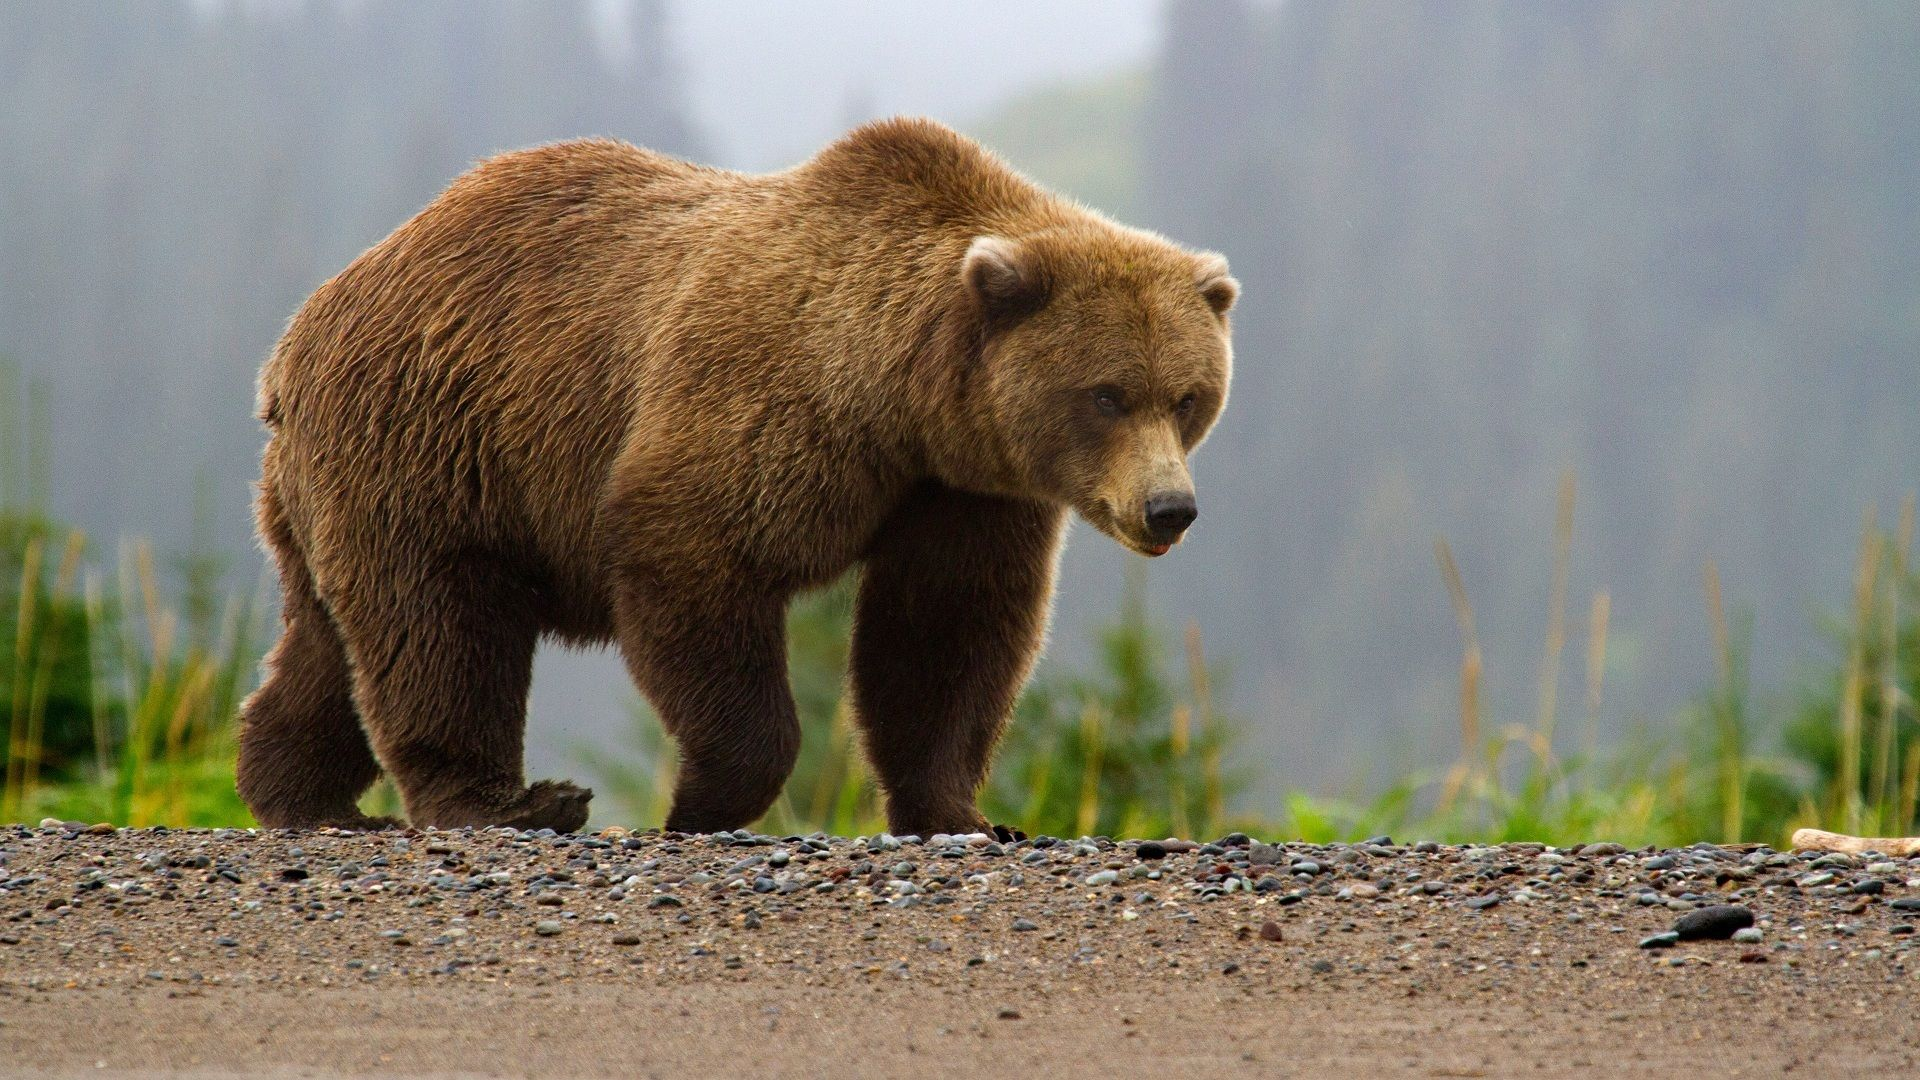 Bears Brown Bears Animals Photo Animal, Bear, Grizzly Wallpaper